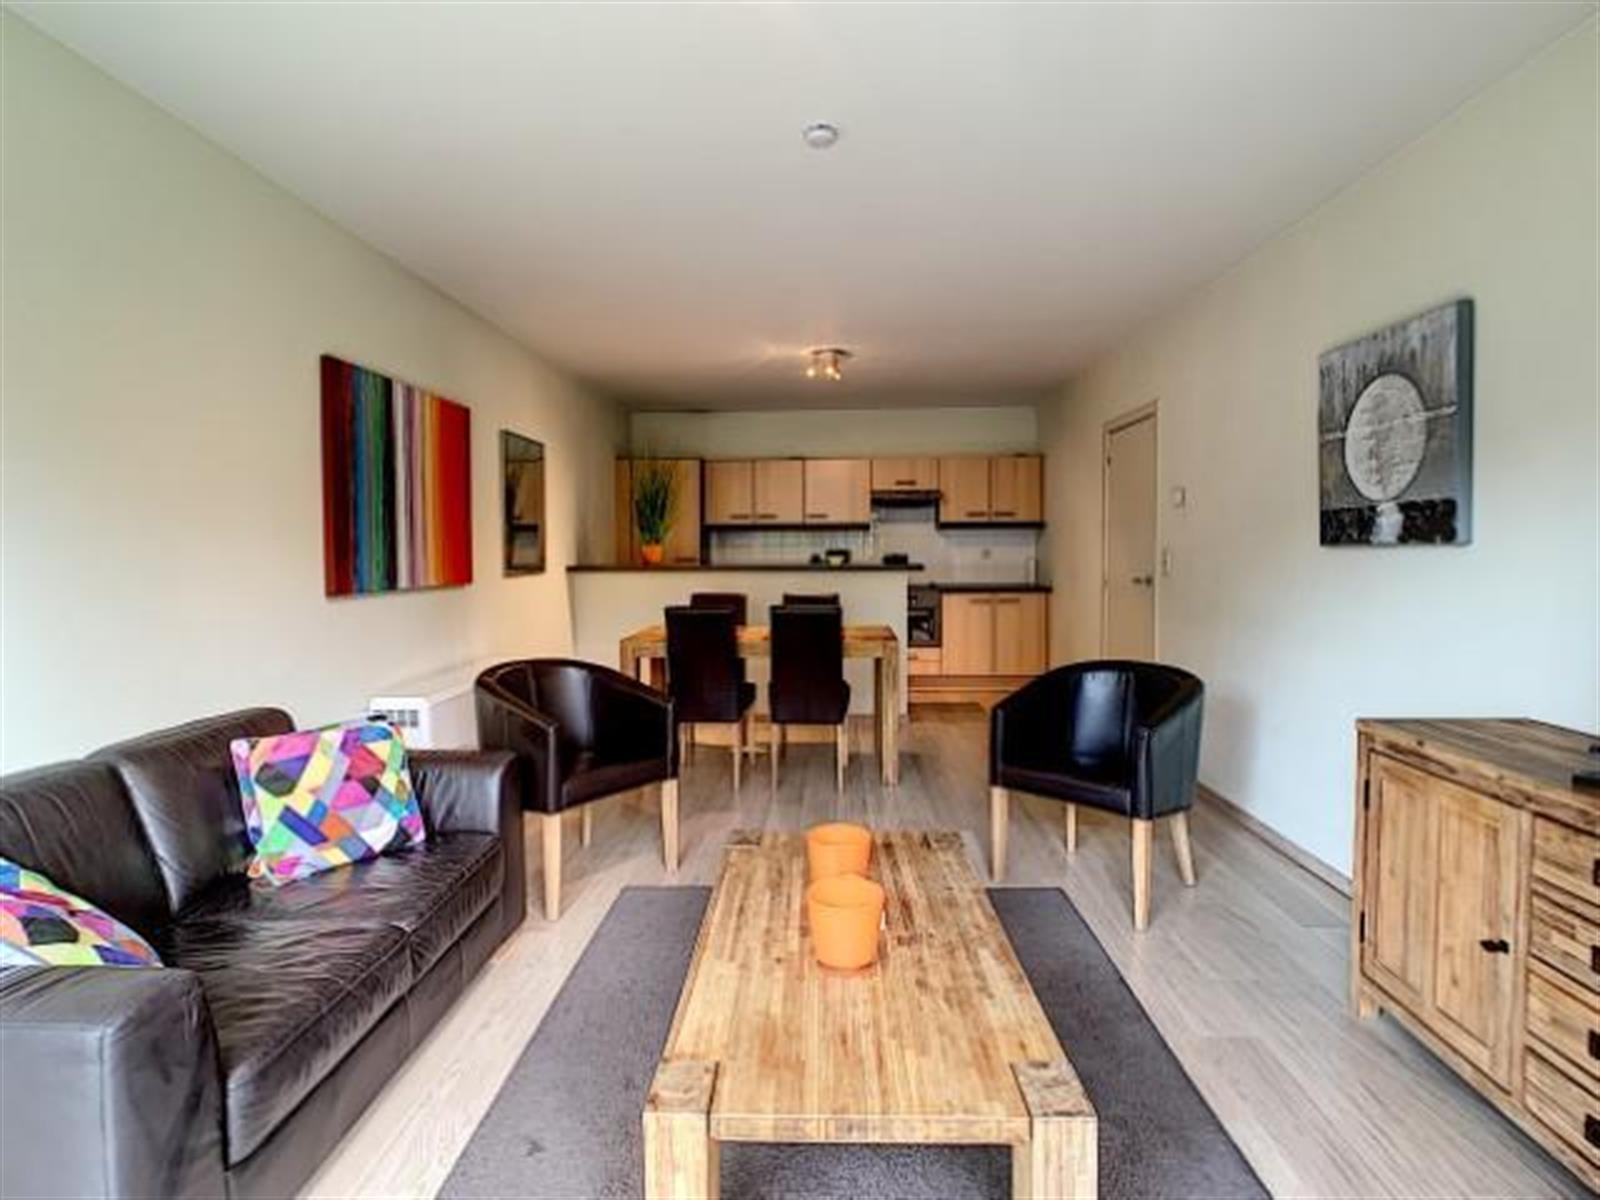 Appartement - Woluwe-Saint-Lambert - #4147227-0